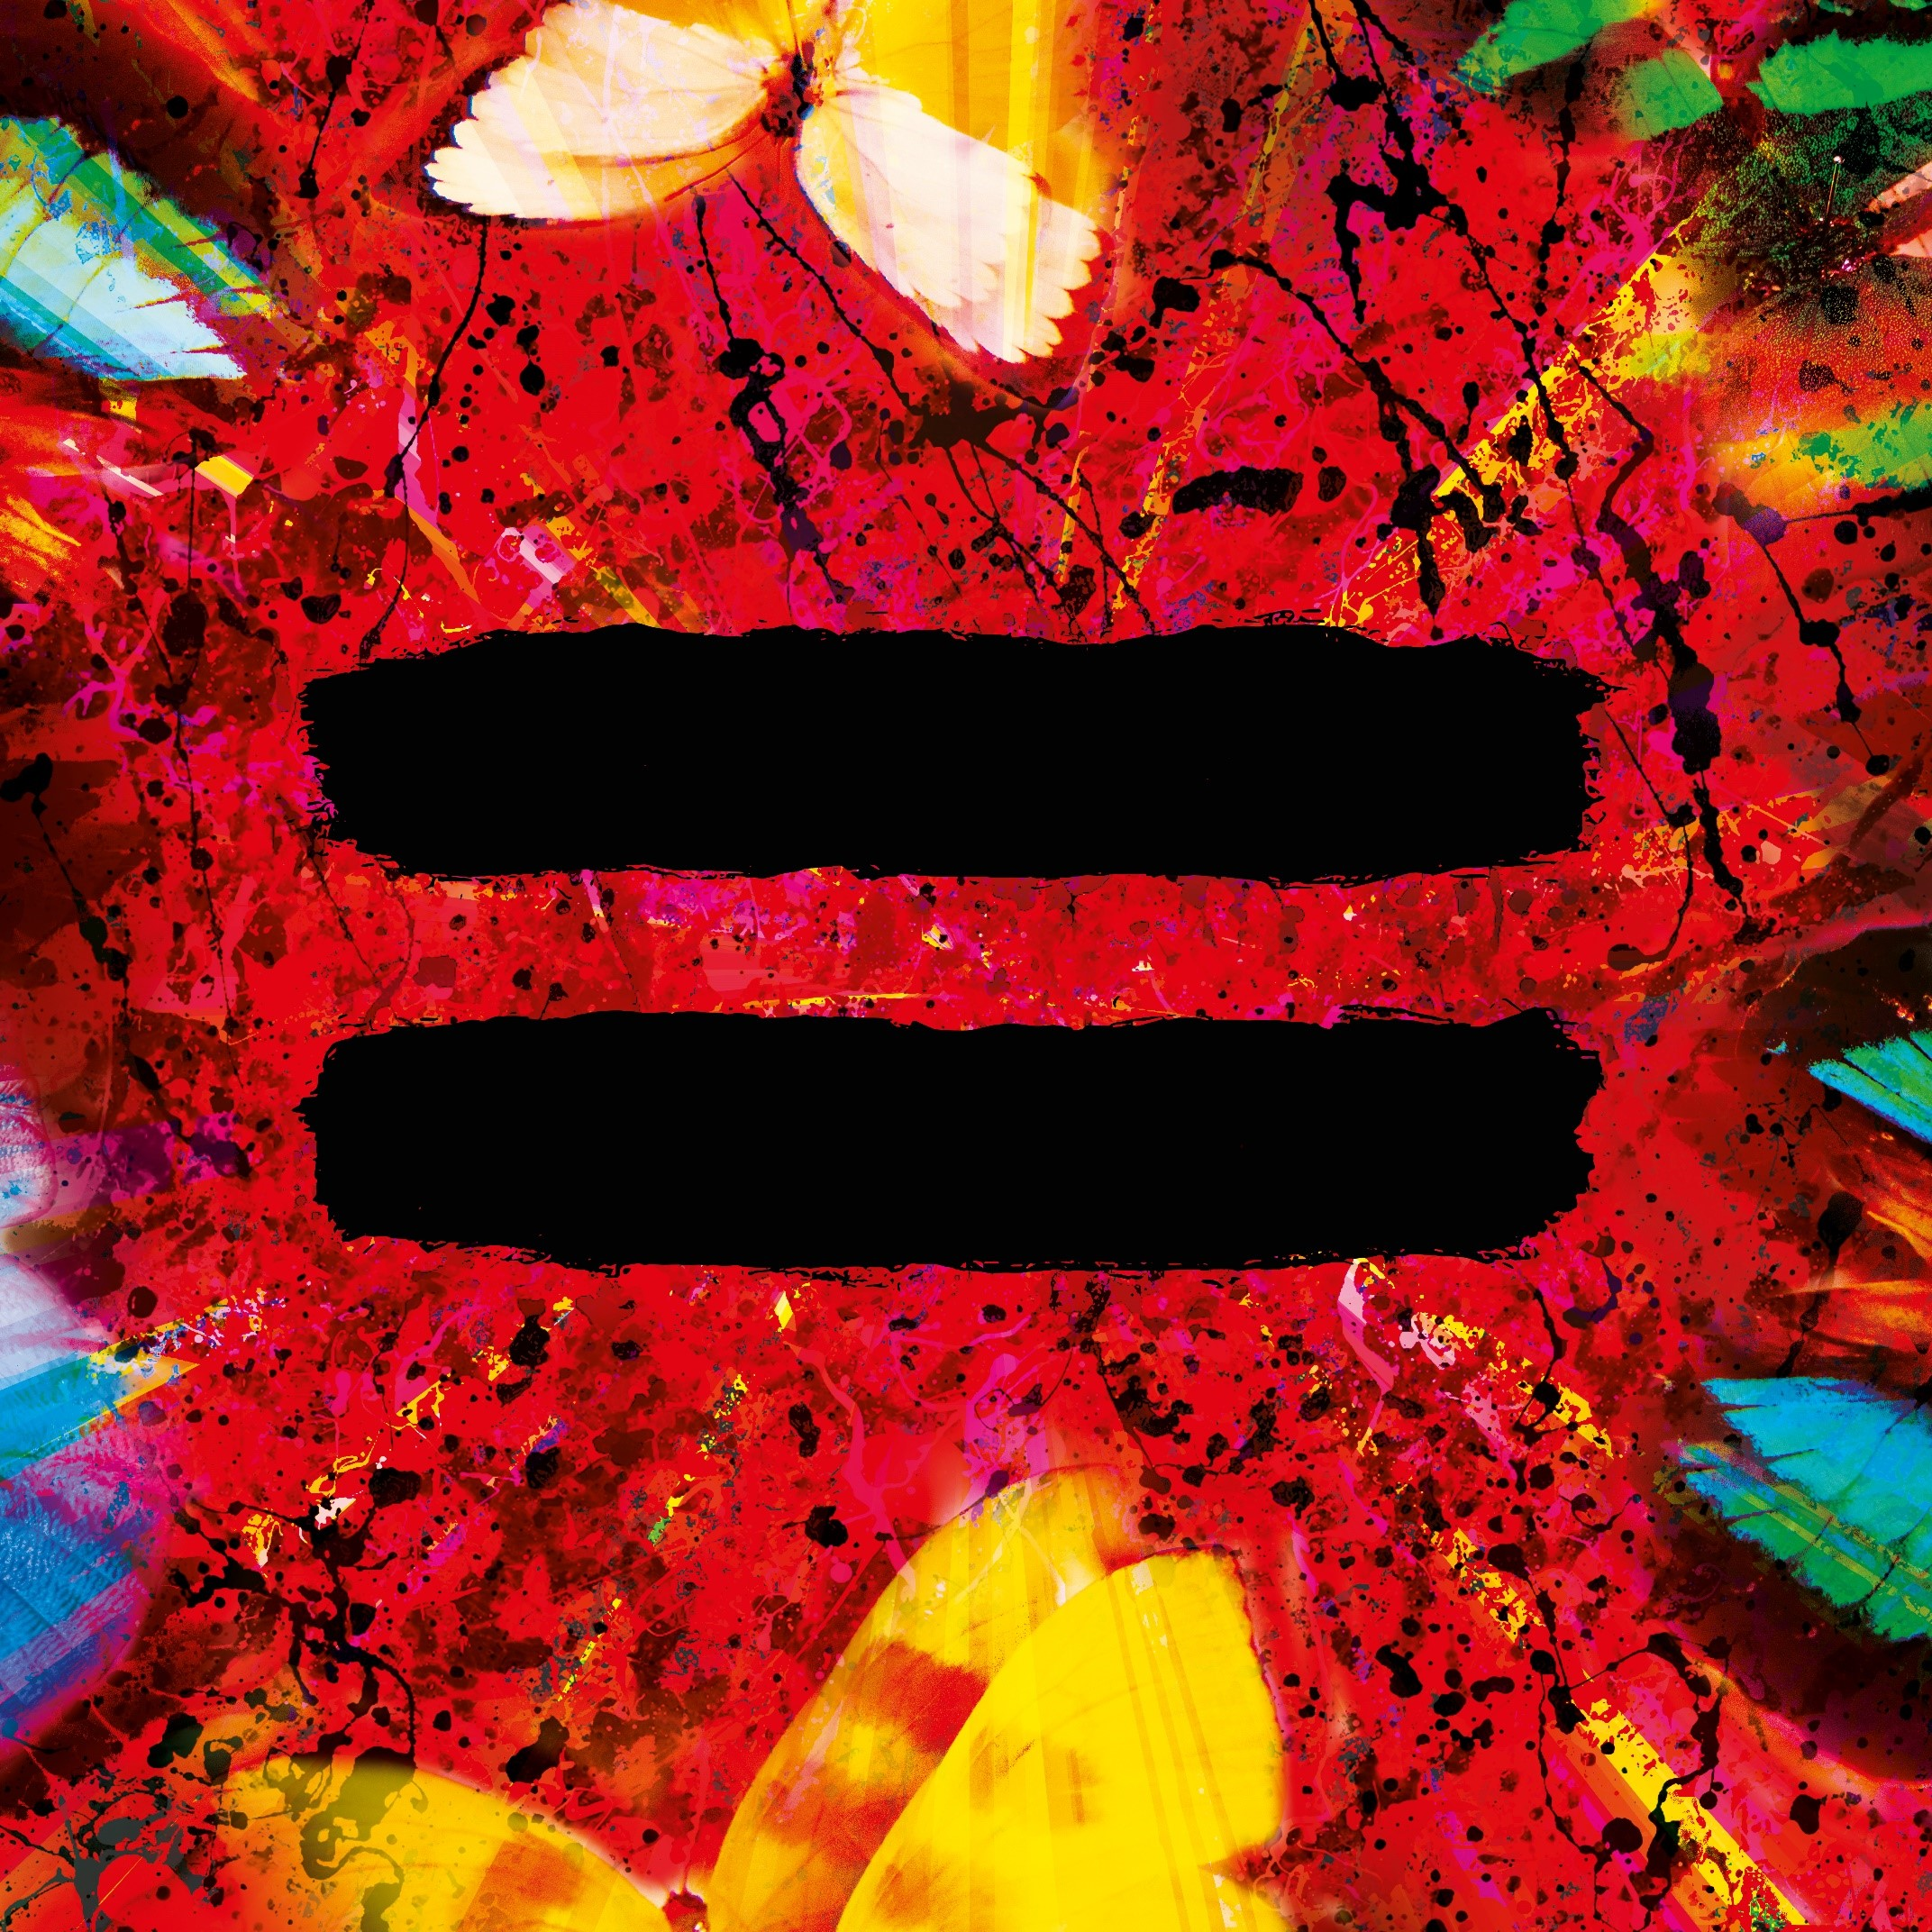 ed sheeran artwork album = equals